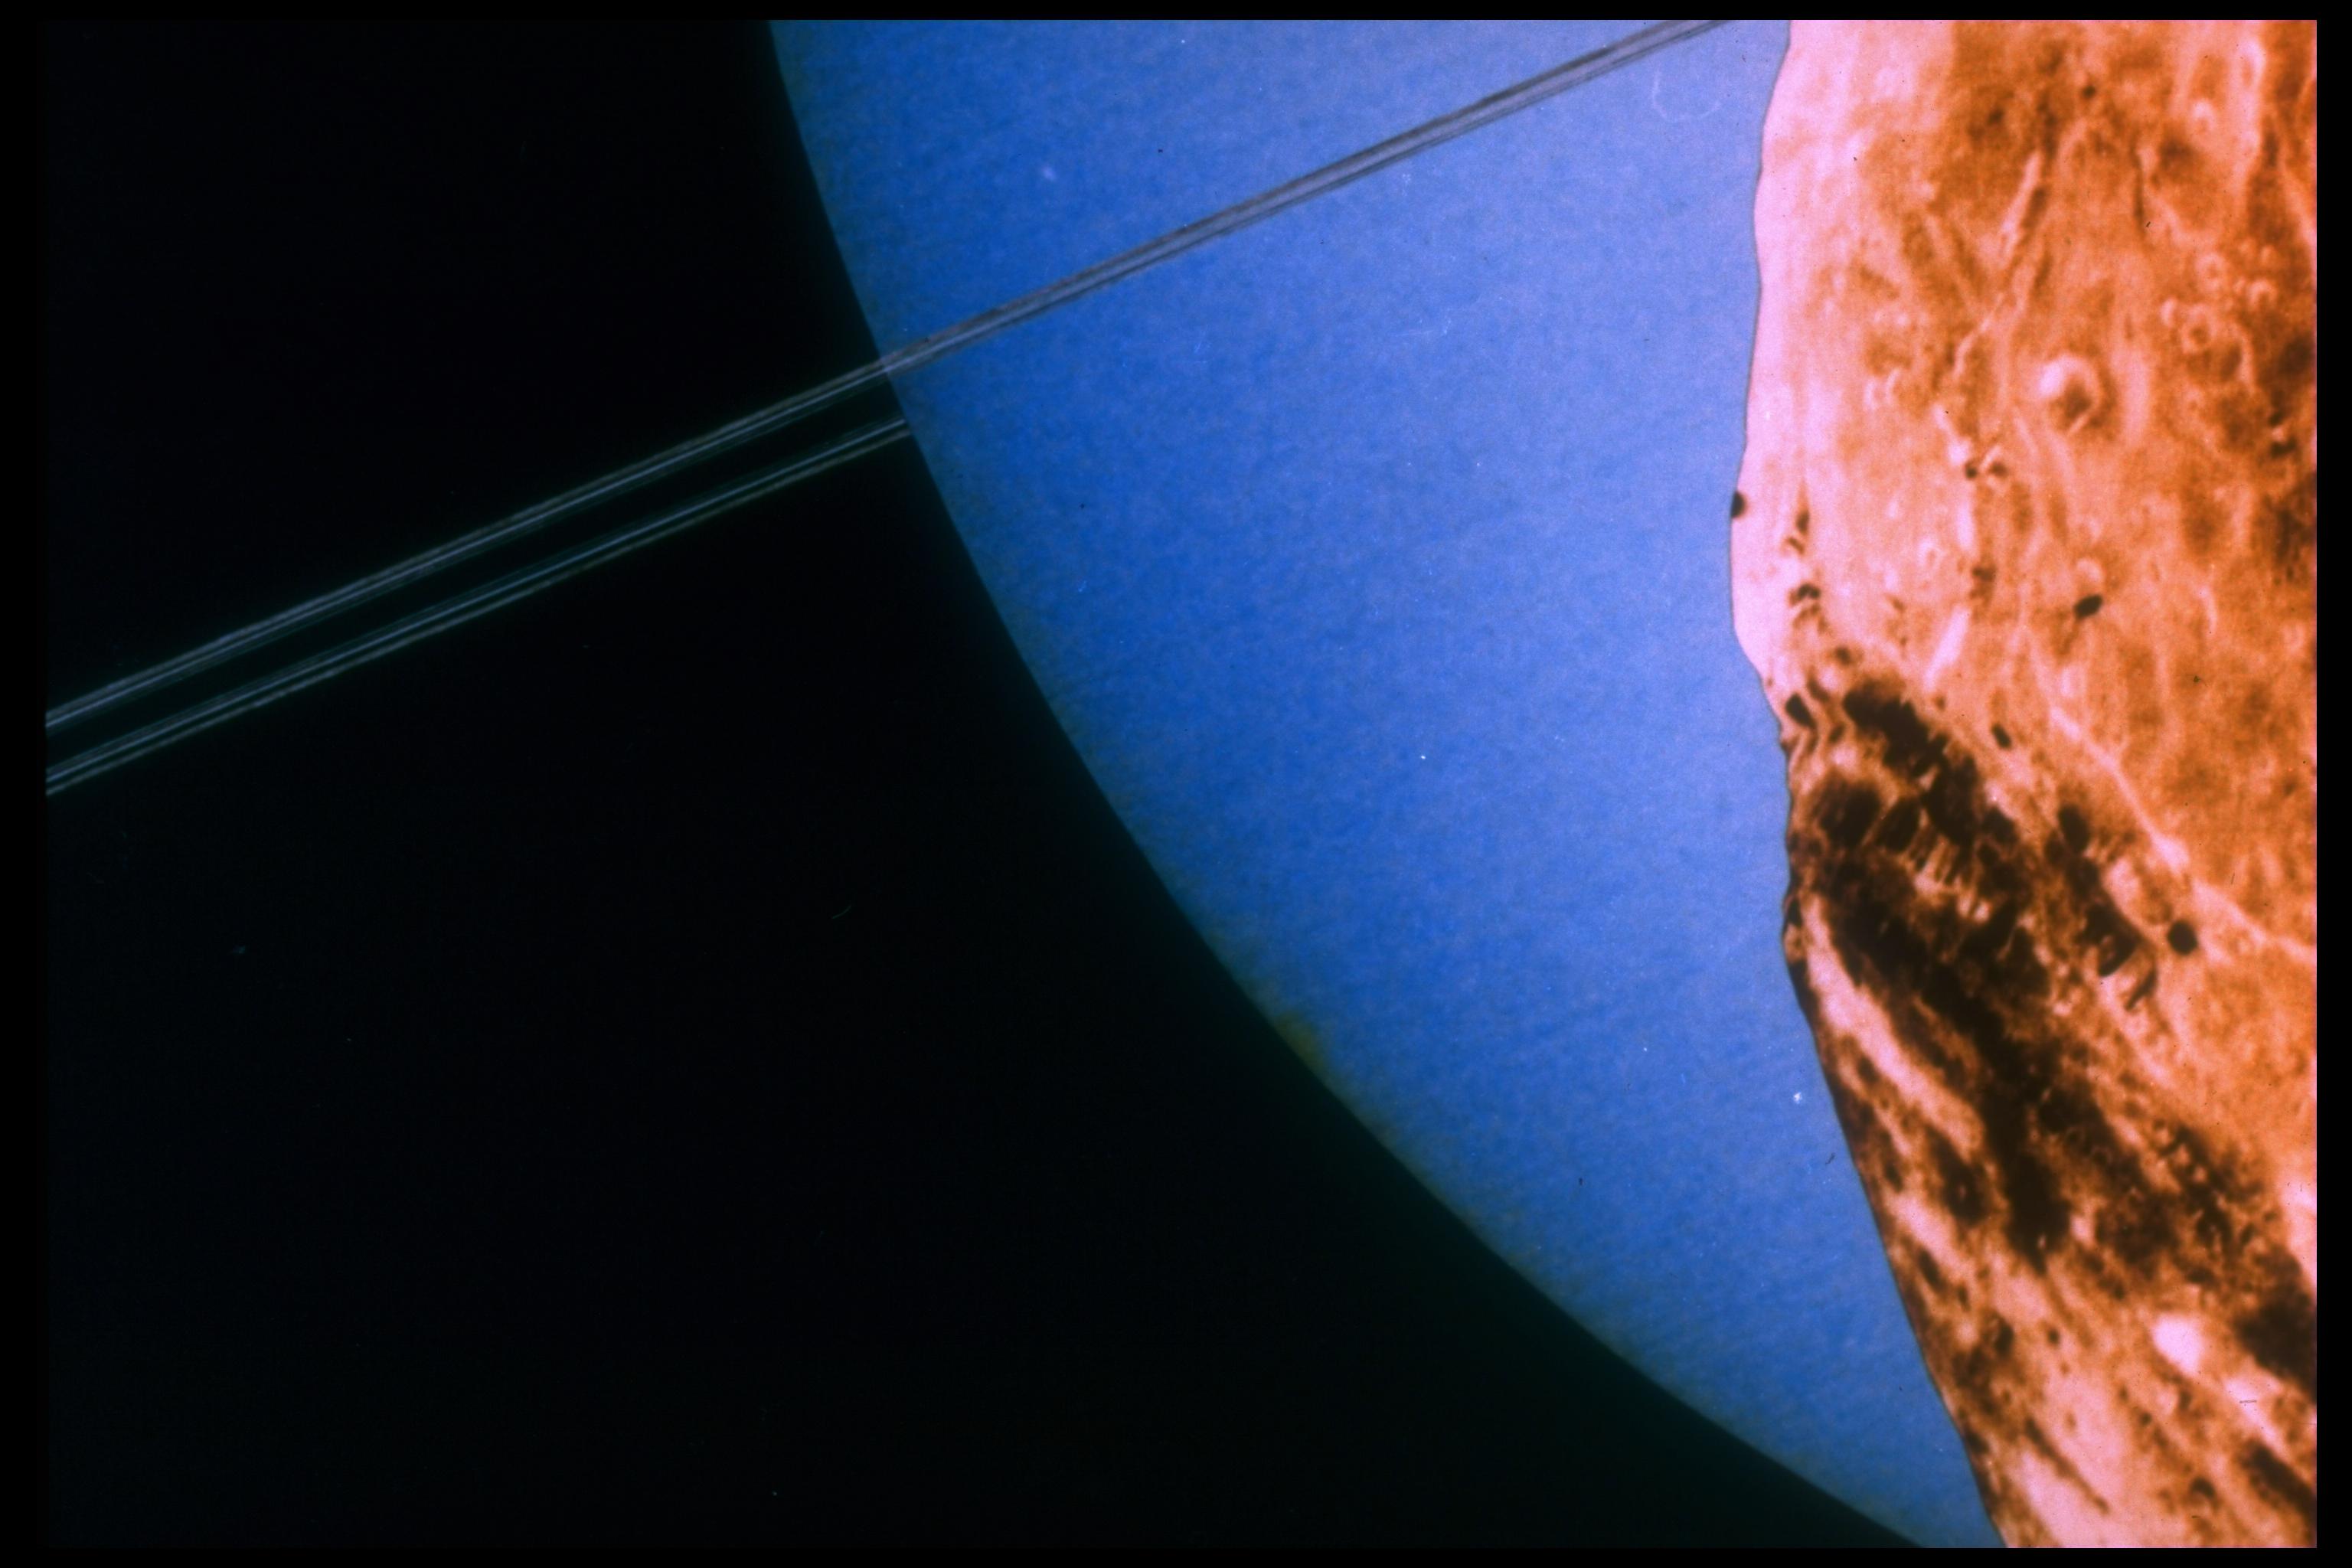 Uranus seen from its moon Miranda, as depicted by Voyager 2 spacecraft.